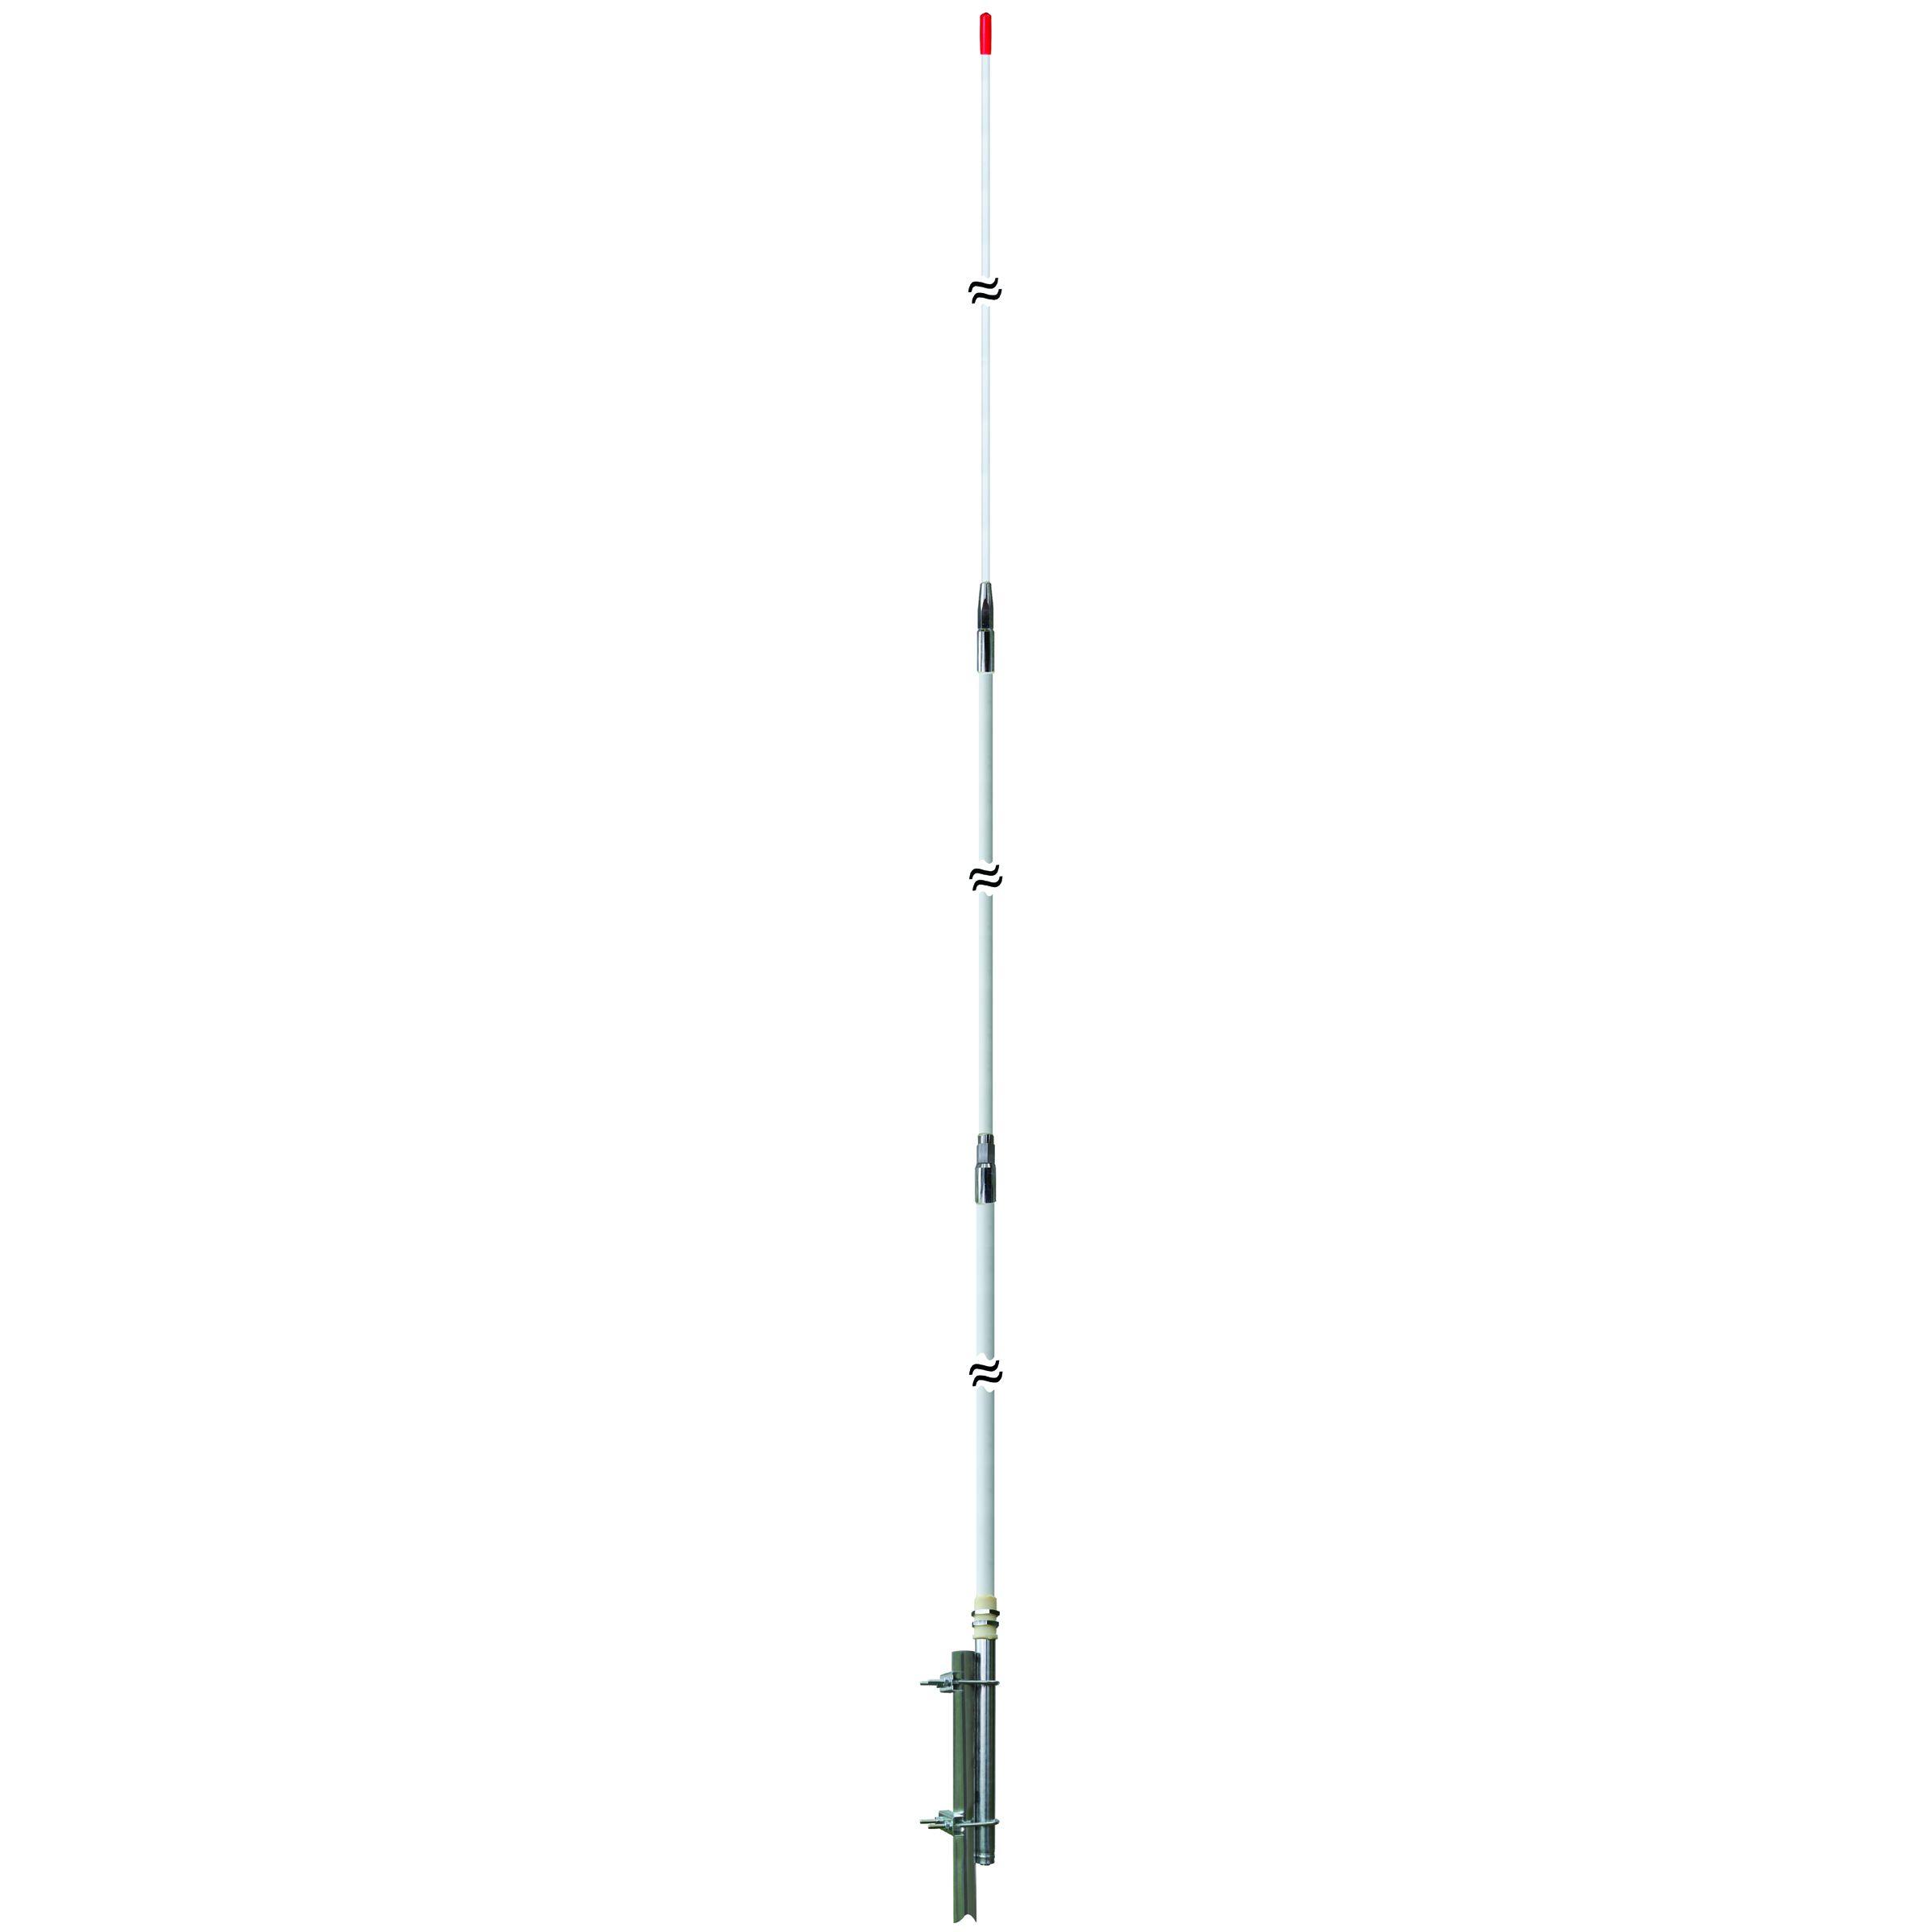 PROTON99 - ProComm 18 Foot Base Station CB or 10 Meter Antenna